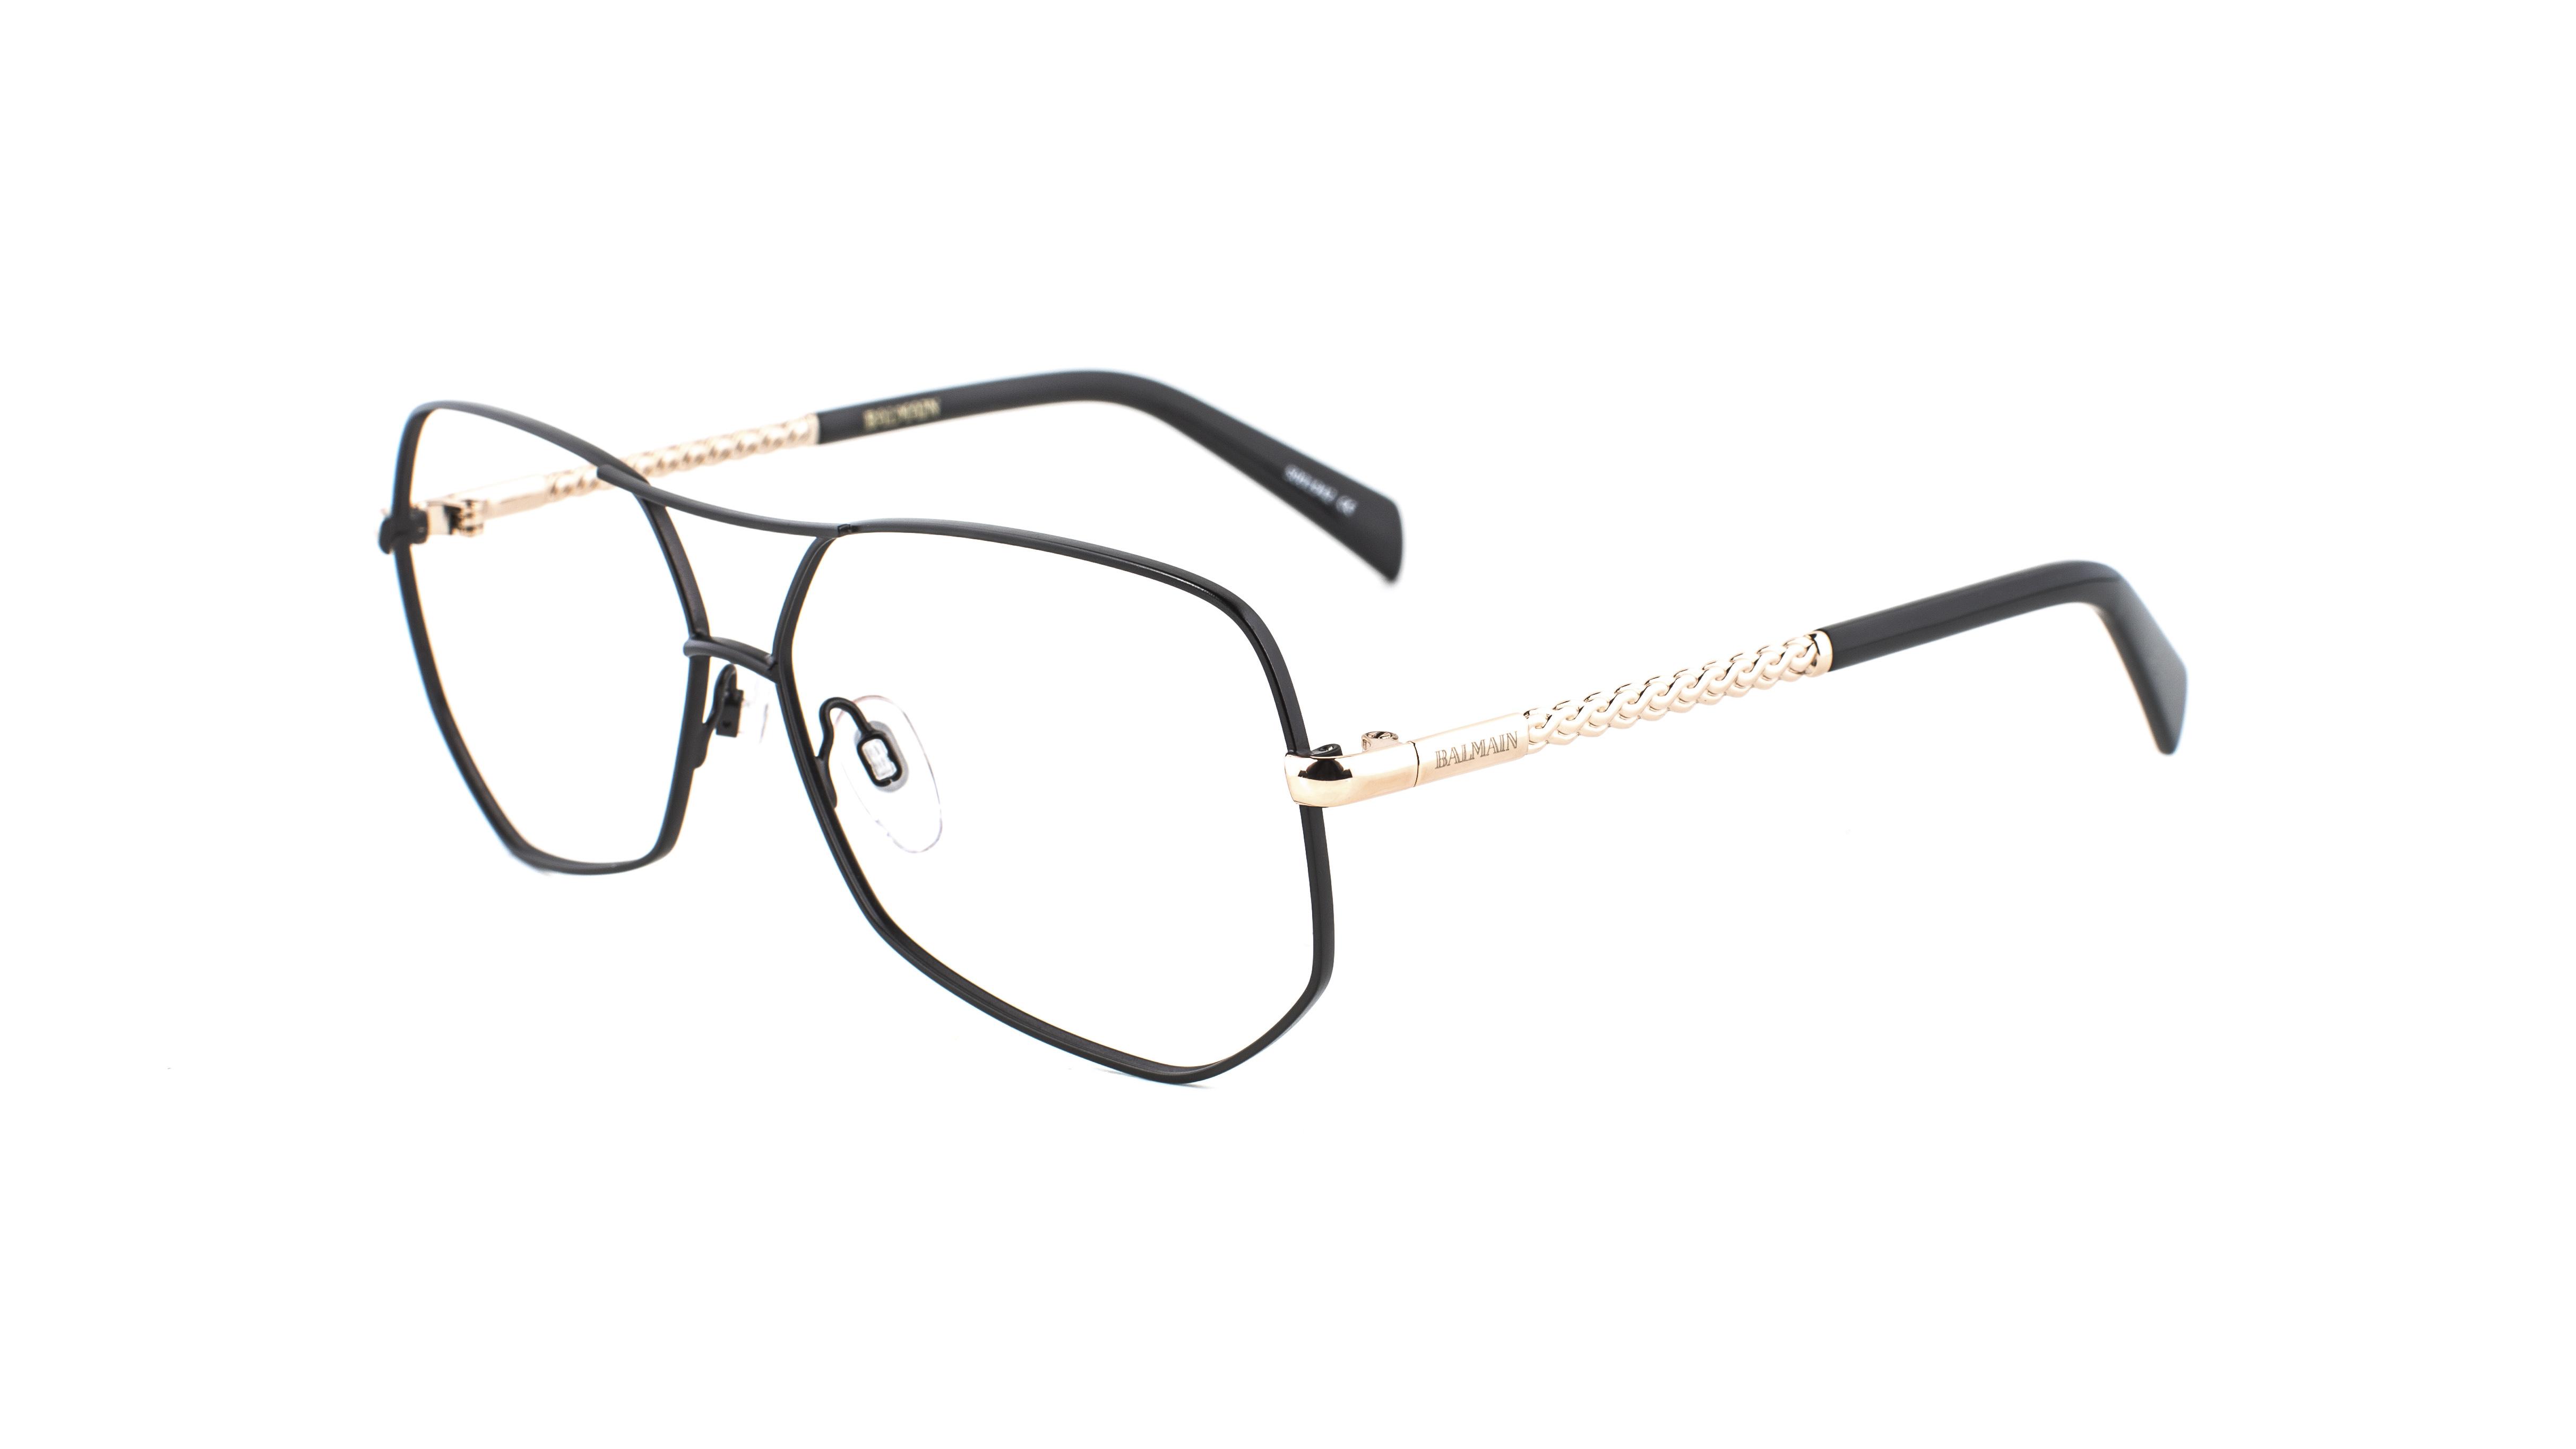 Balmain x Specsavers BL158S 30570672 - RRP 2 pairs single vision $459